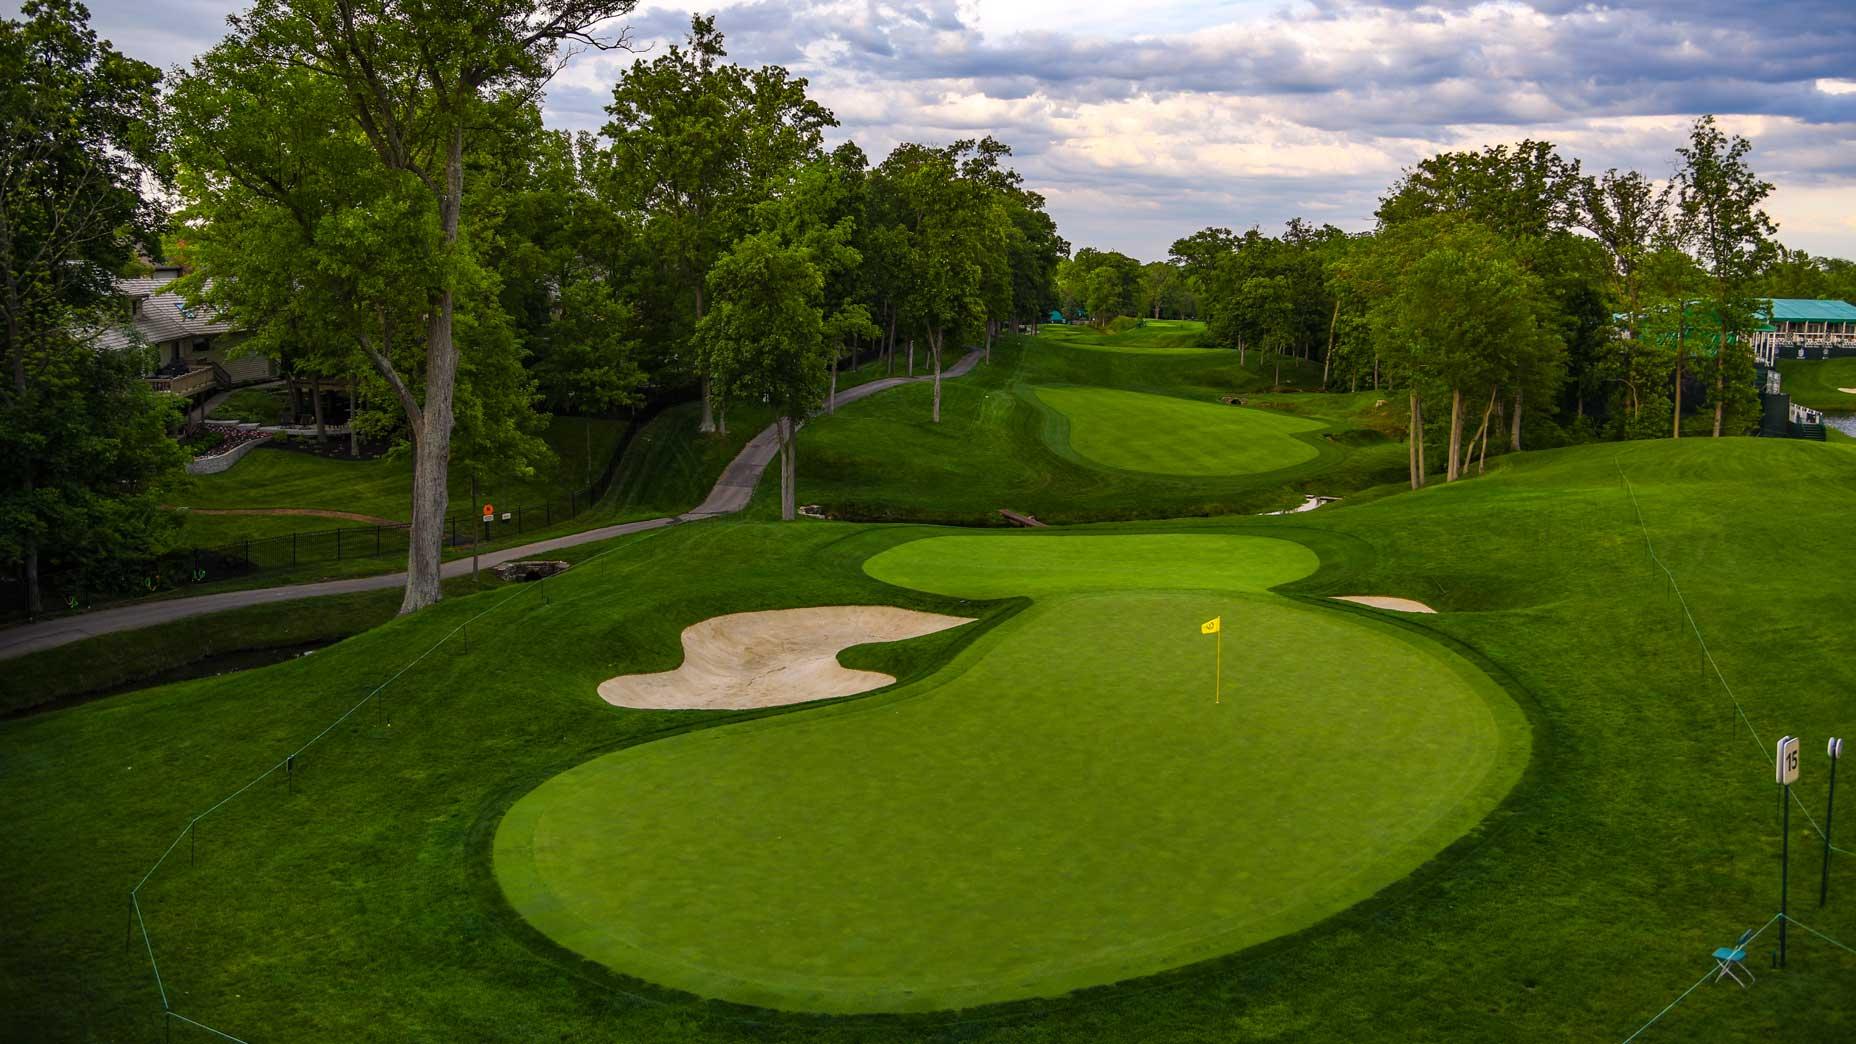 The par-5 15th hole at Muirfield Village Golf Club in 2017.